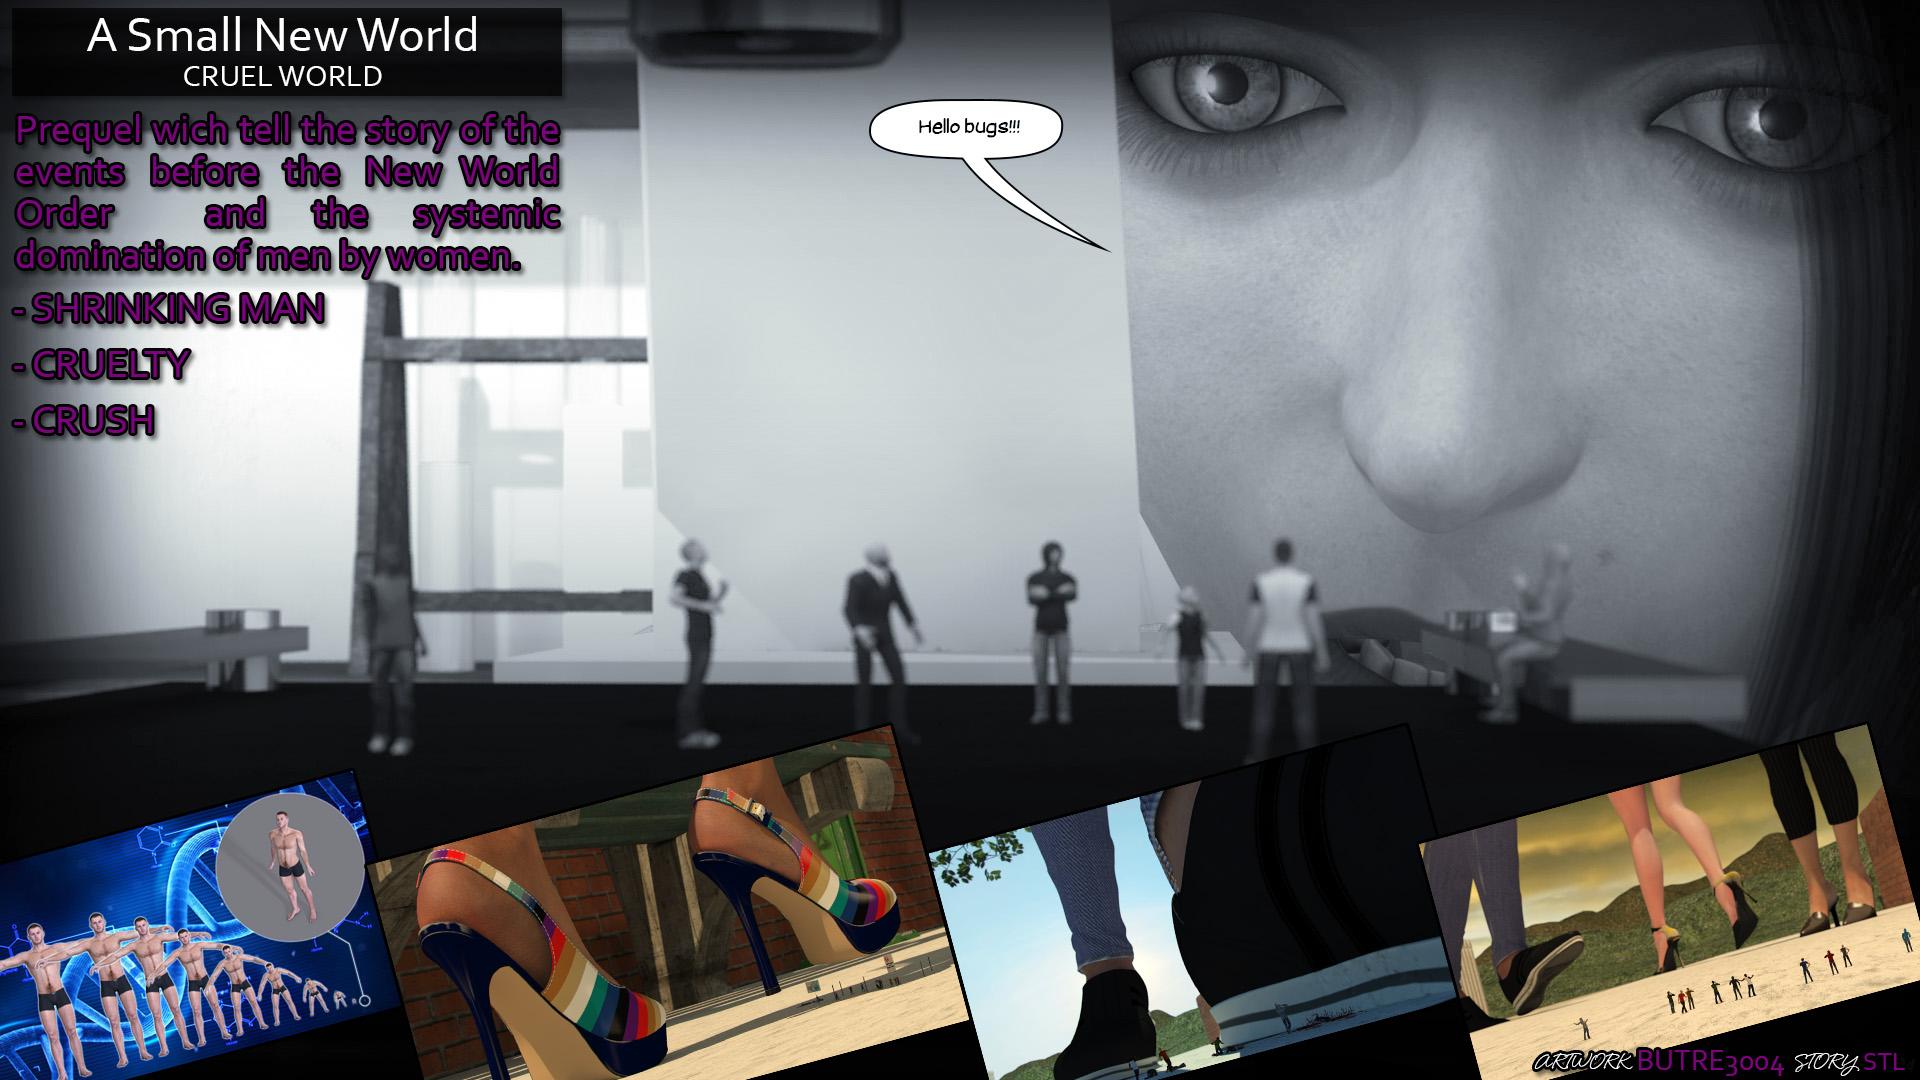 Promo Asnw- Cruel World by butre3004